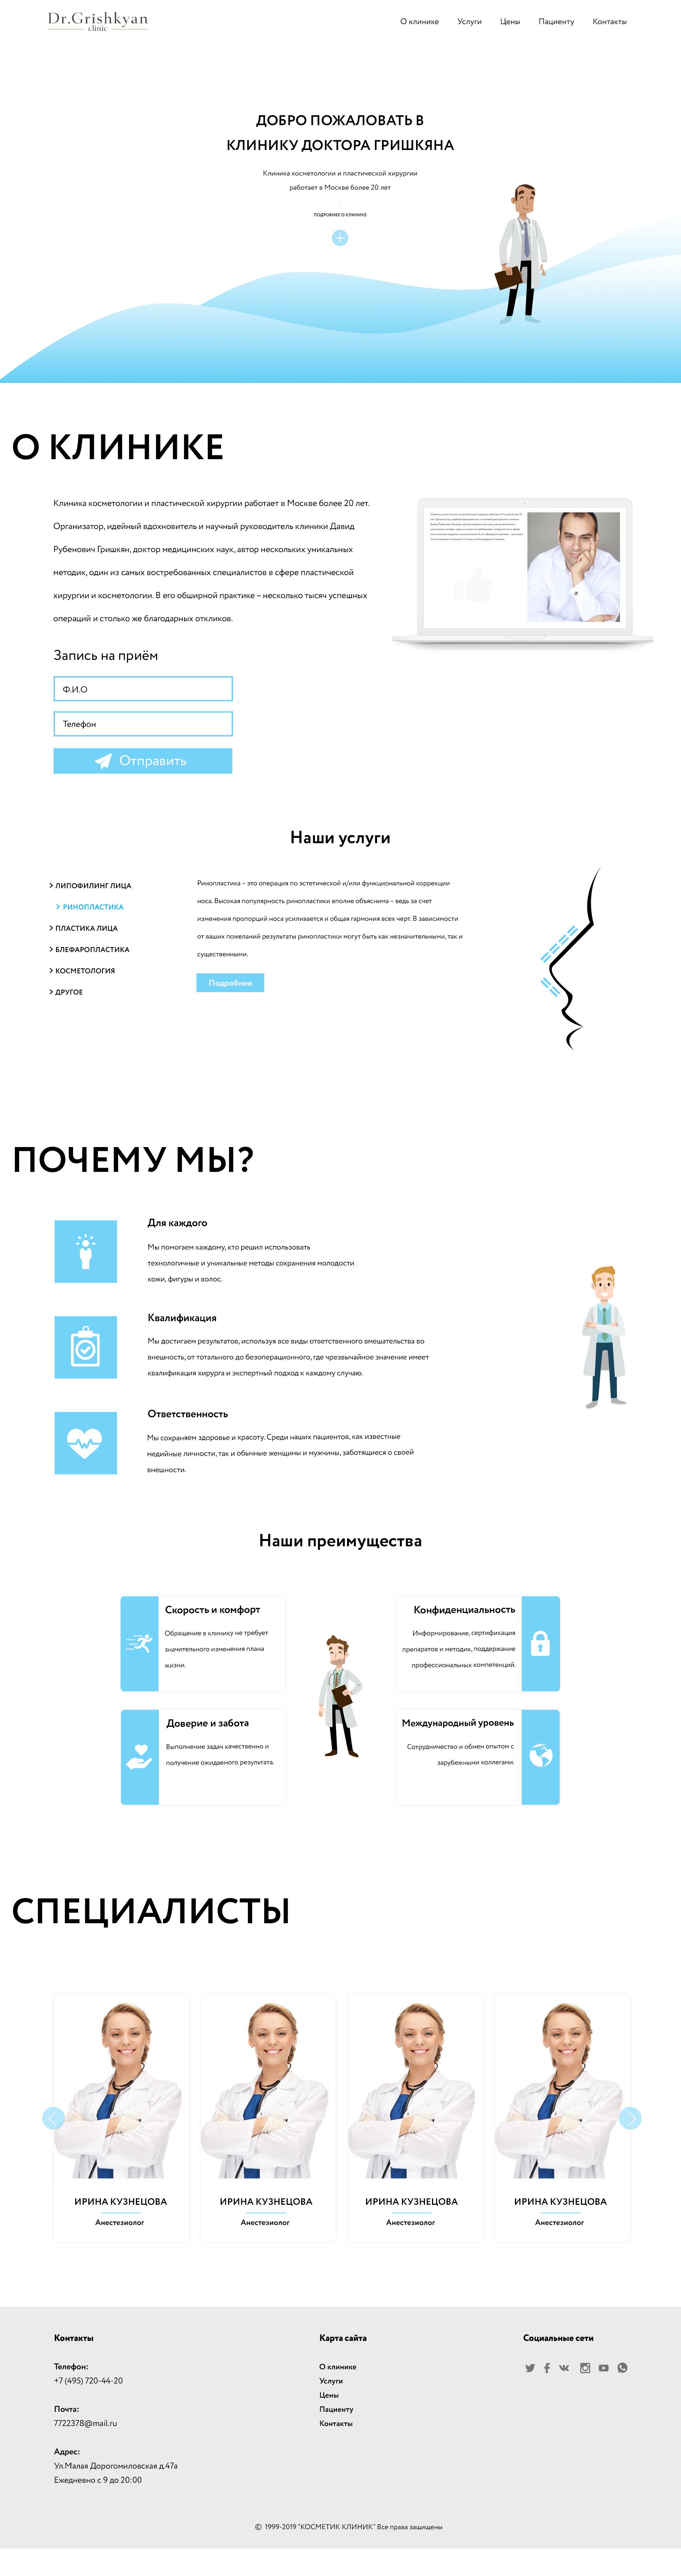 Разработка дизайн концепта главной страницы сайта. фото f_8365c96ba63e255f.png